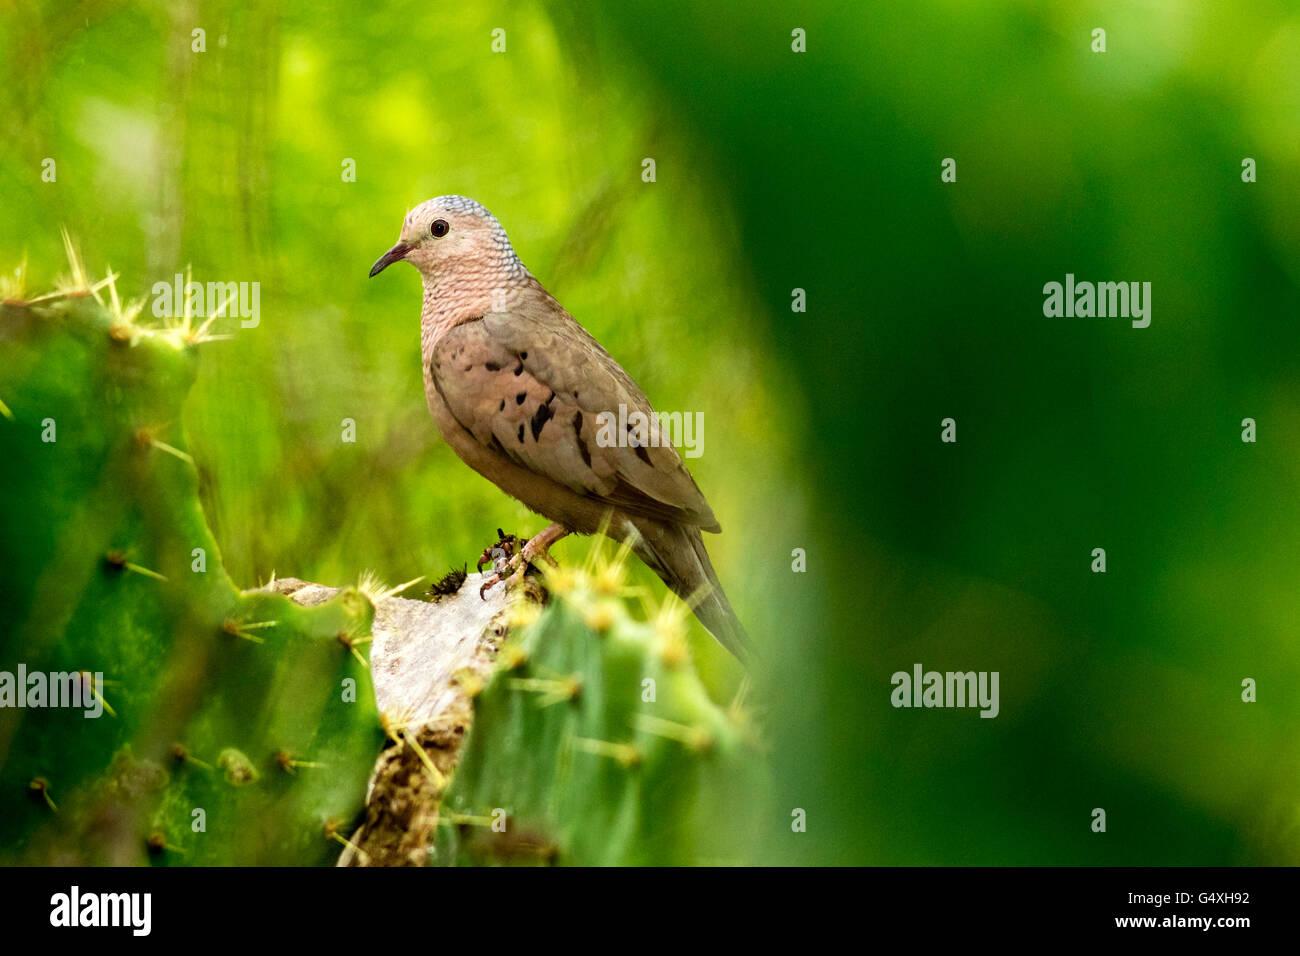 Common Ground-dove (Columbina passerina ) - Camp Lula Sams, Brownsville, Texas, USA - Stock Image